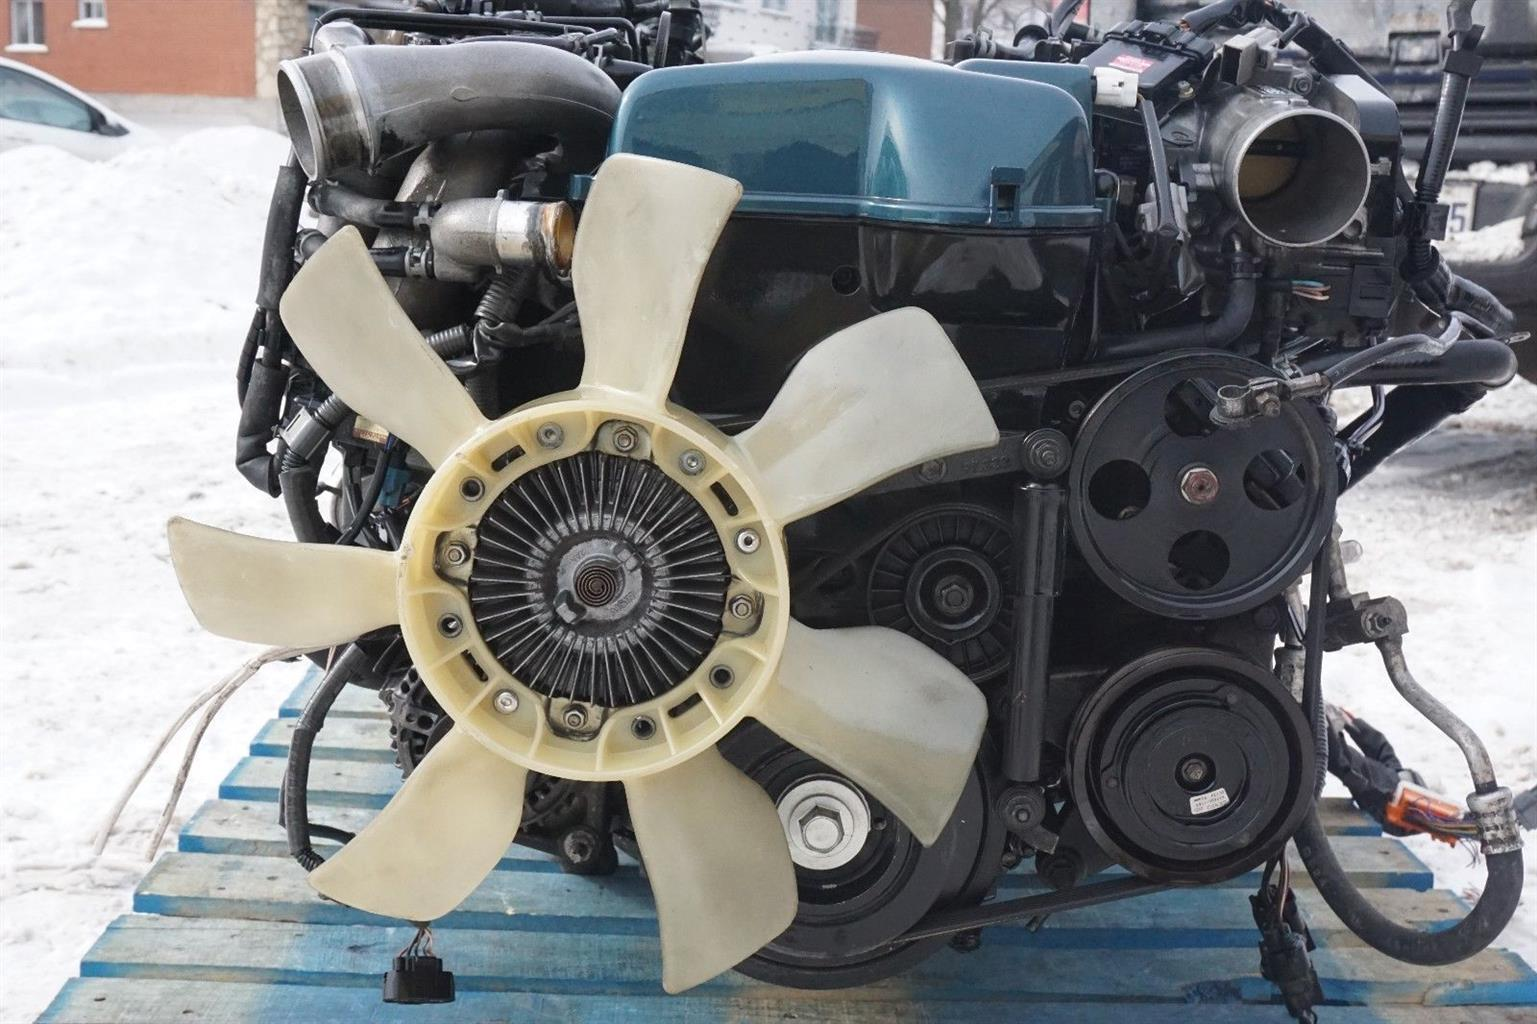 Jdm Toyota Supra Mk4 2jzgte Engine 6speed Getrag Transmission Junk Wiring Harness Supera